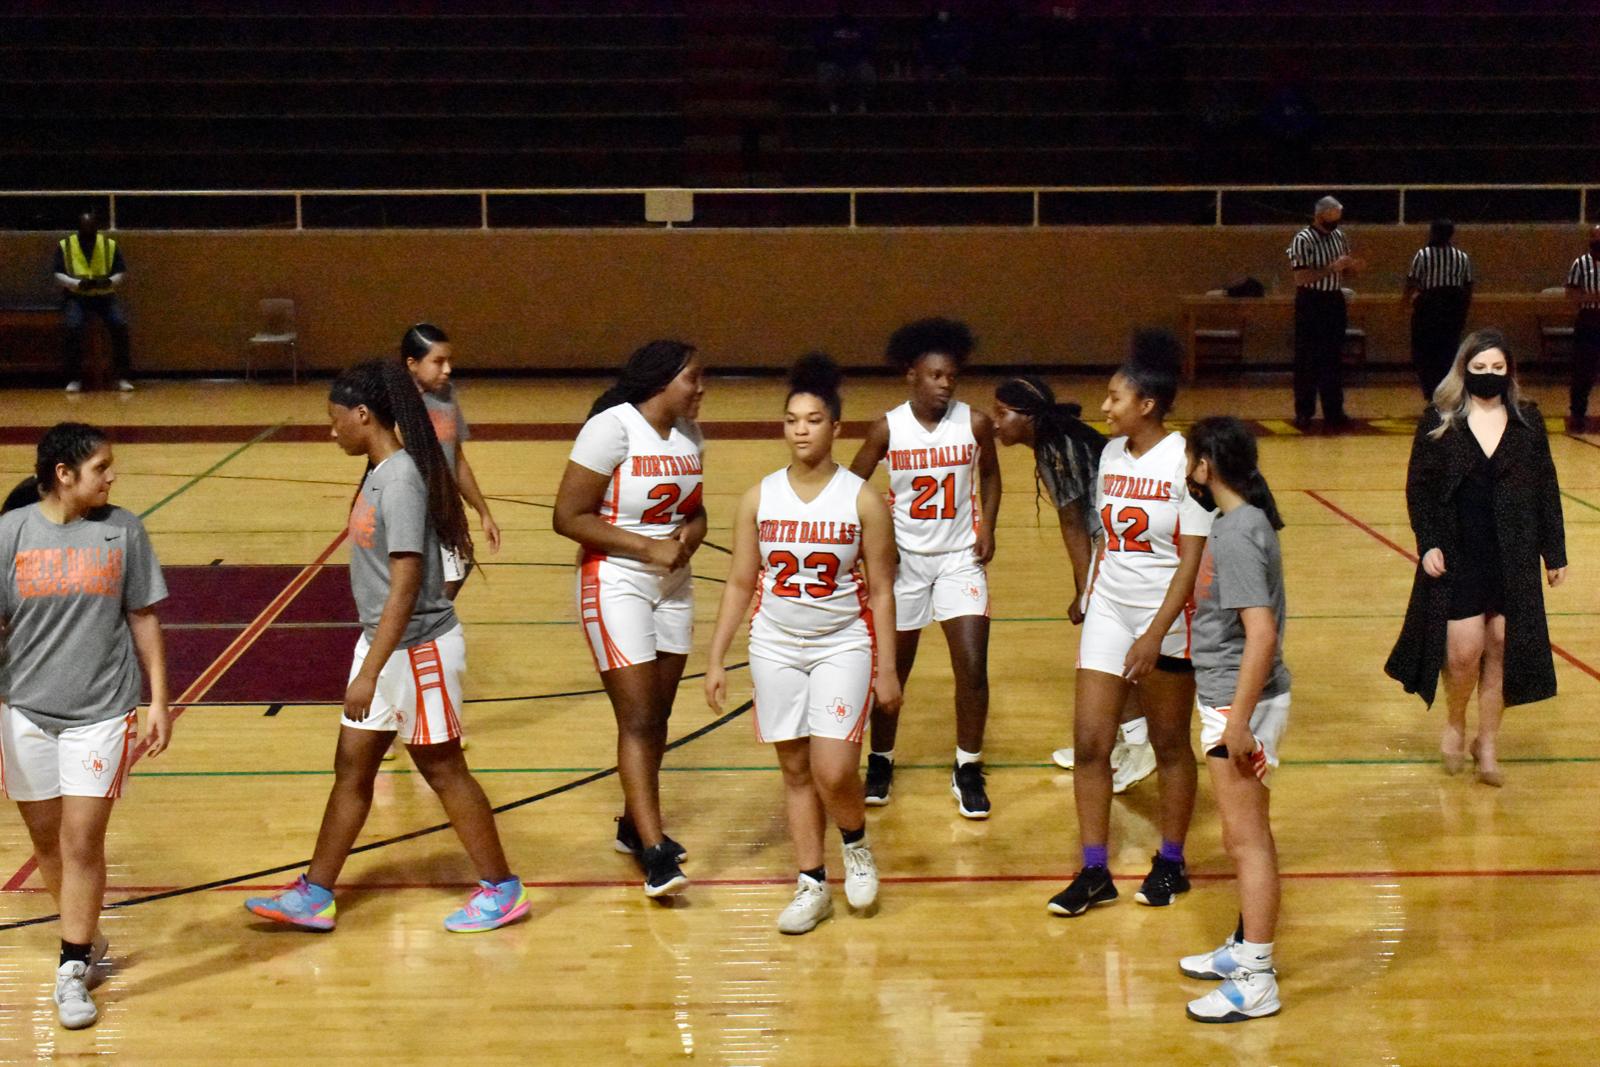 Photo gallery: North Dallas Lady Bulldogs basketball team vs. Wilmer-Hutchins — Feb. 3, 2021